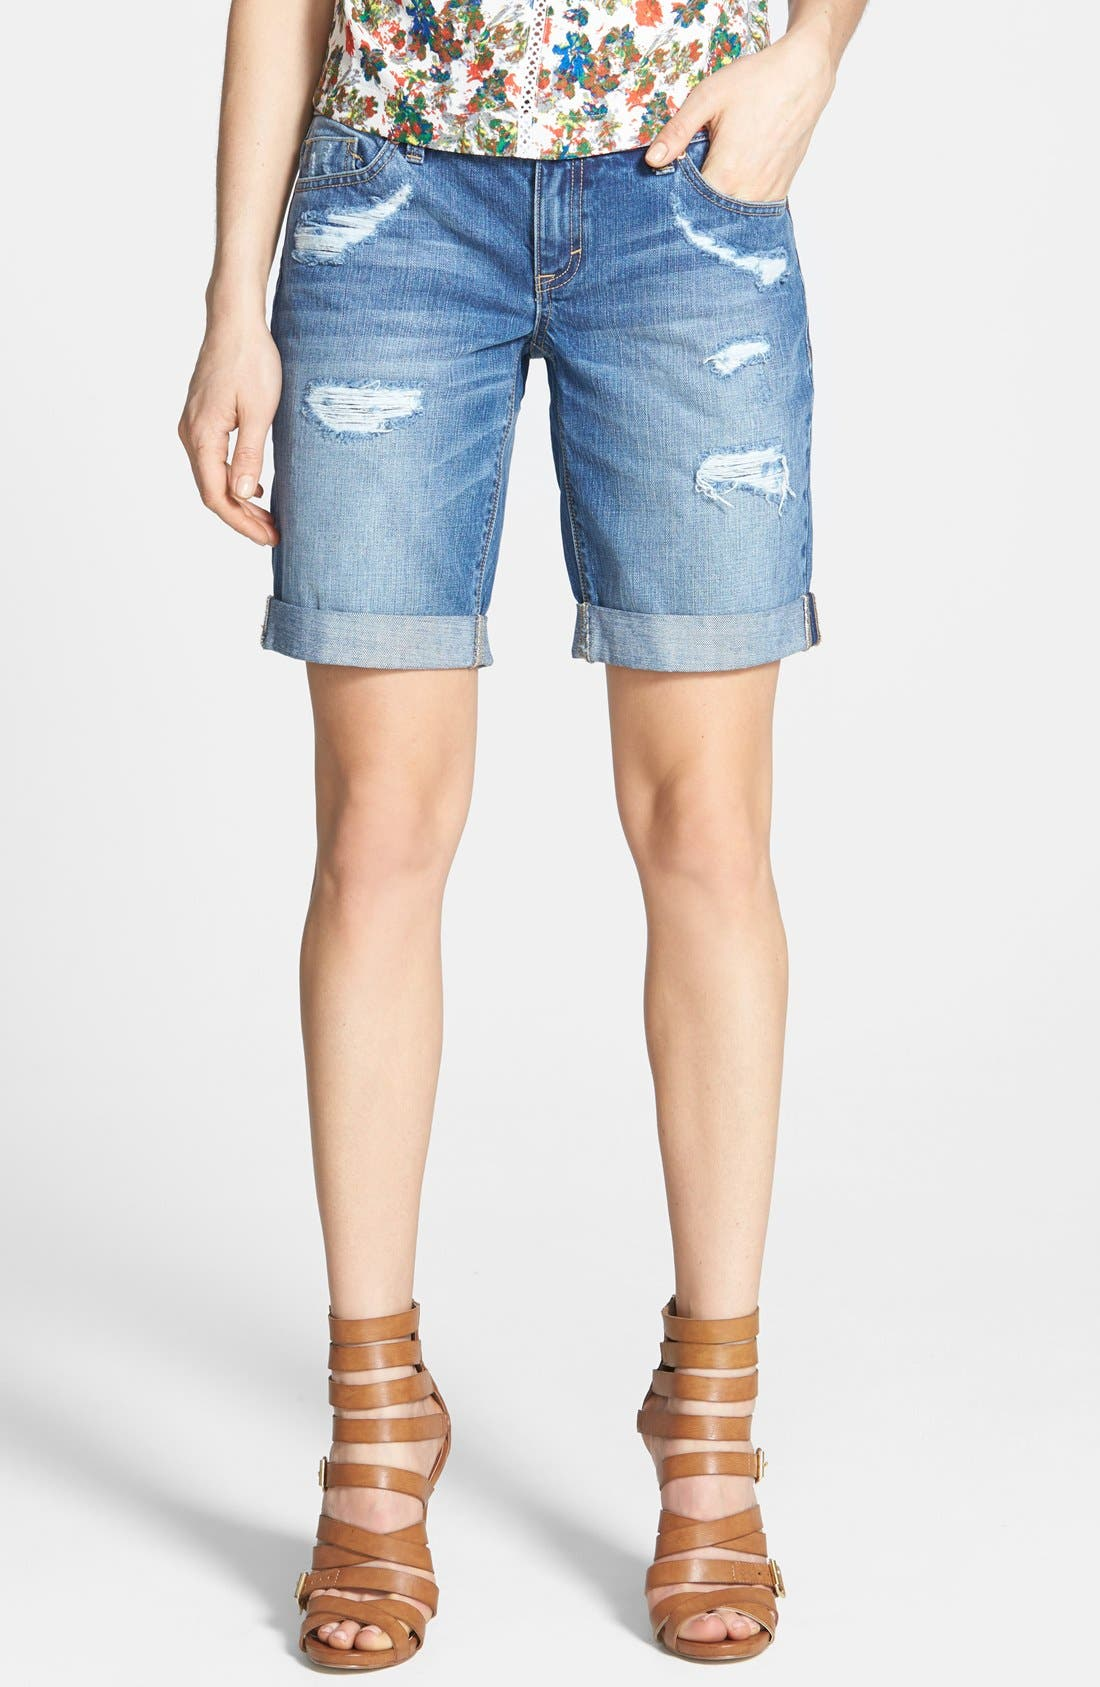 Main Image - Dittos 'Avery' Destroyed Denim Bermuda Shorts (Medium Vintage)